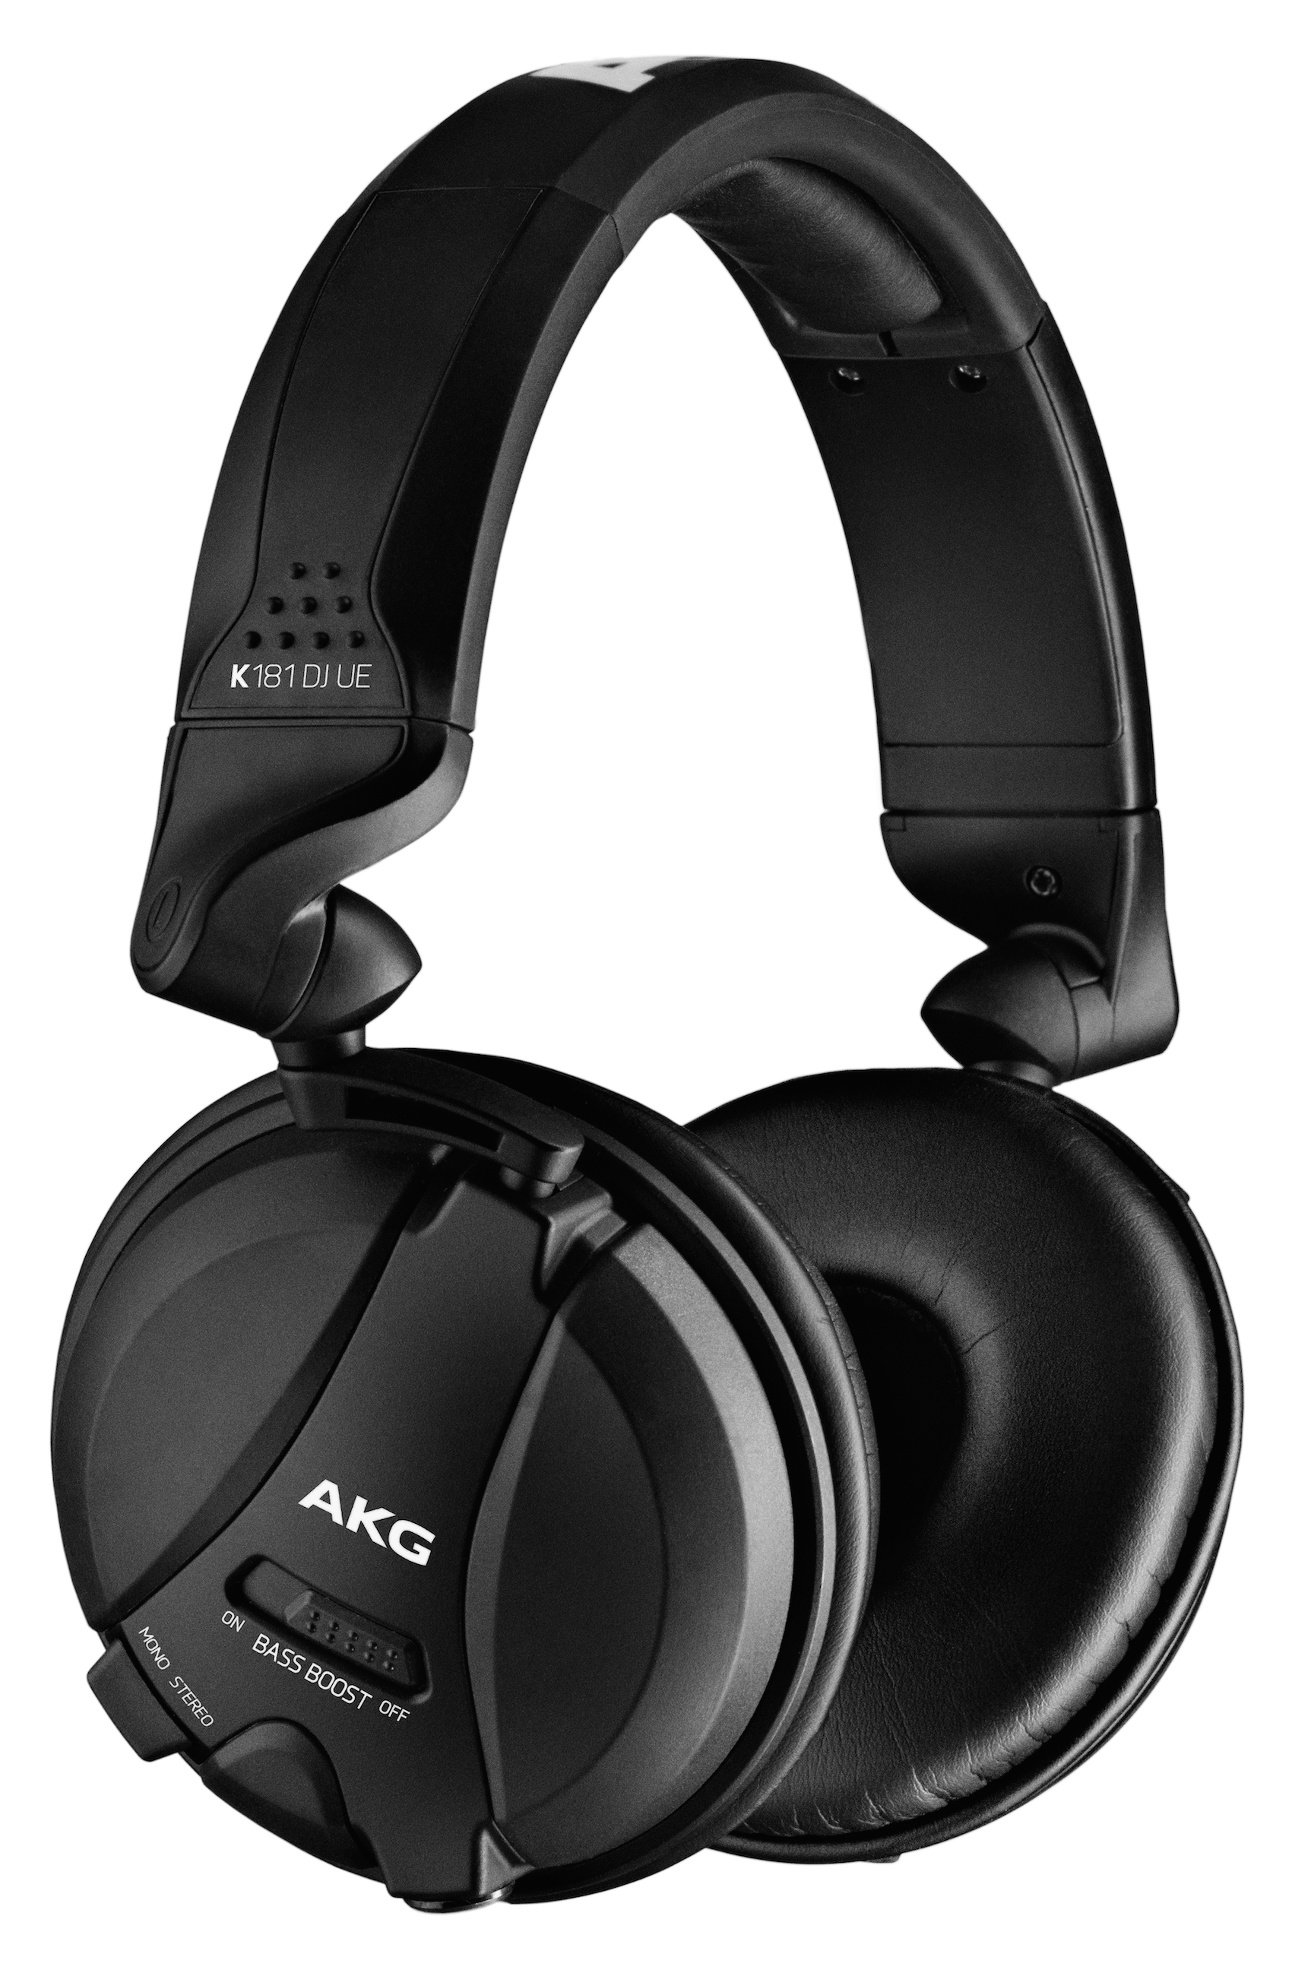 AKG K181 DJ UE Ultimate Edition Closed Back DJ Headphones K181-DJ-ULTIMATE